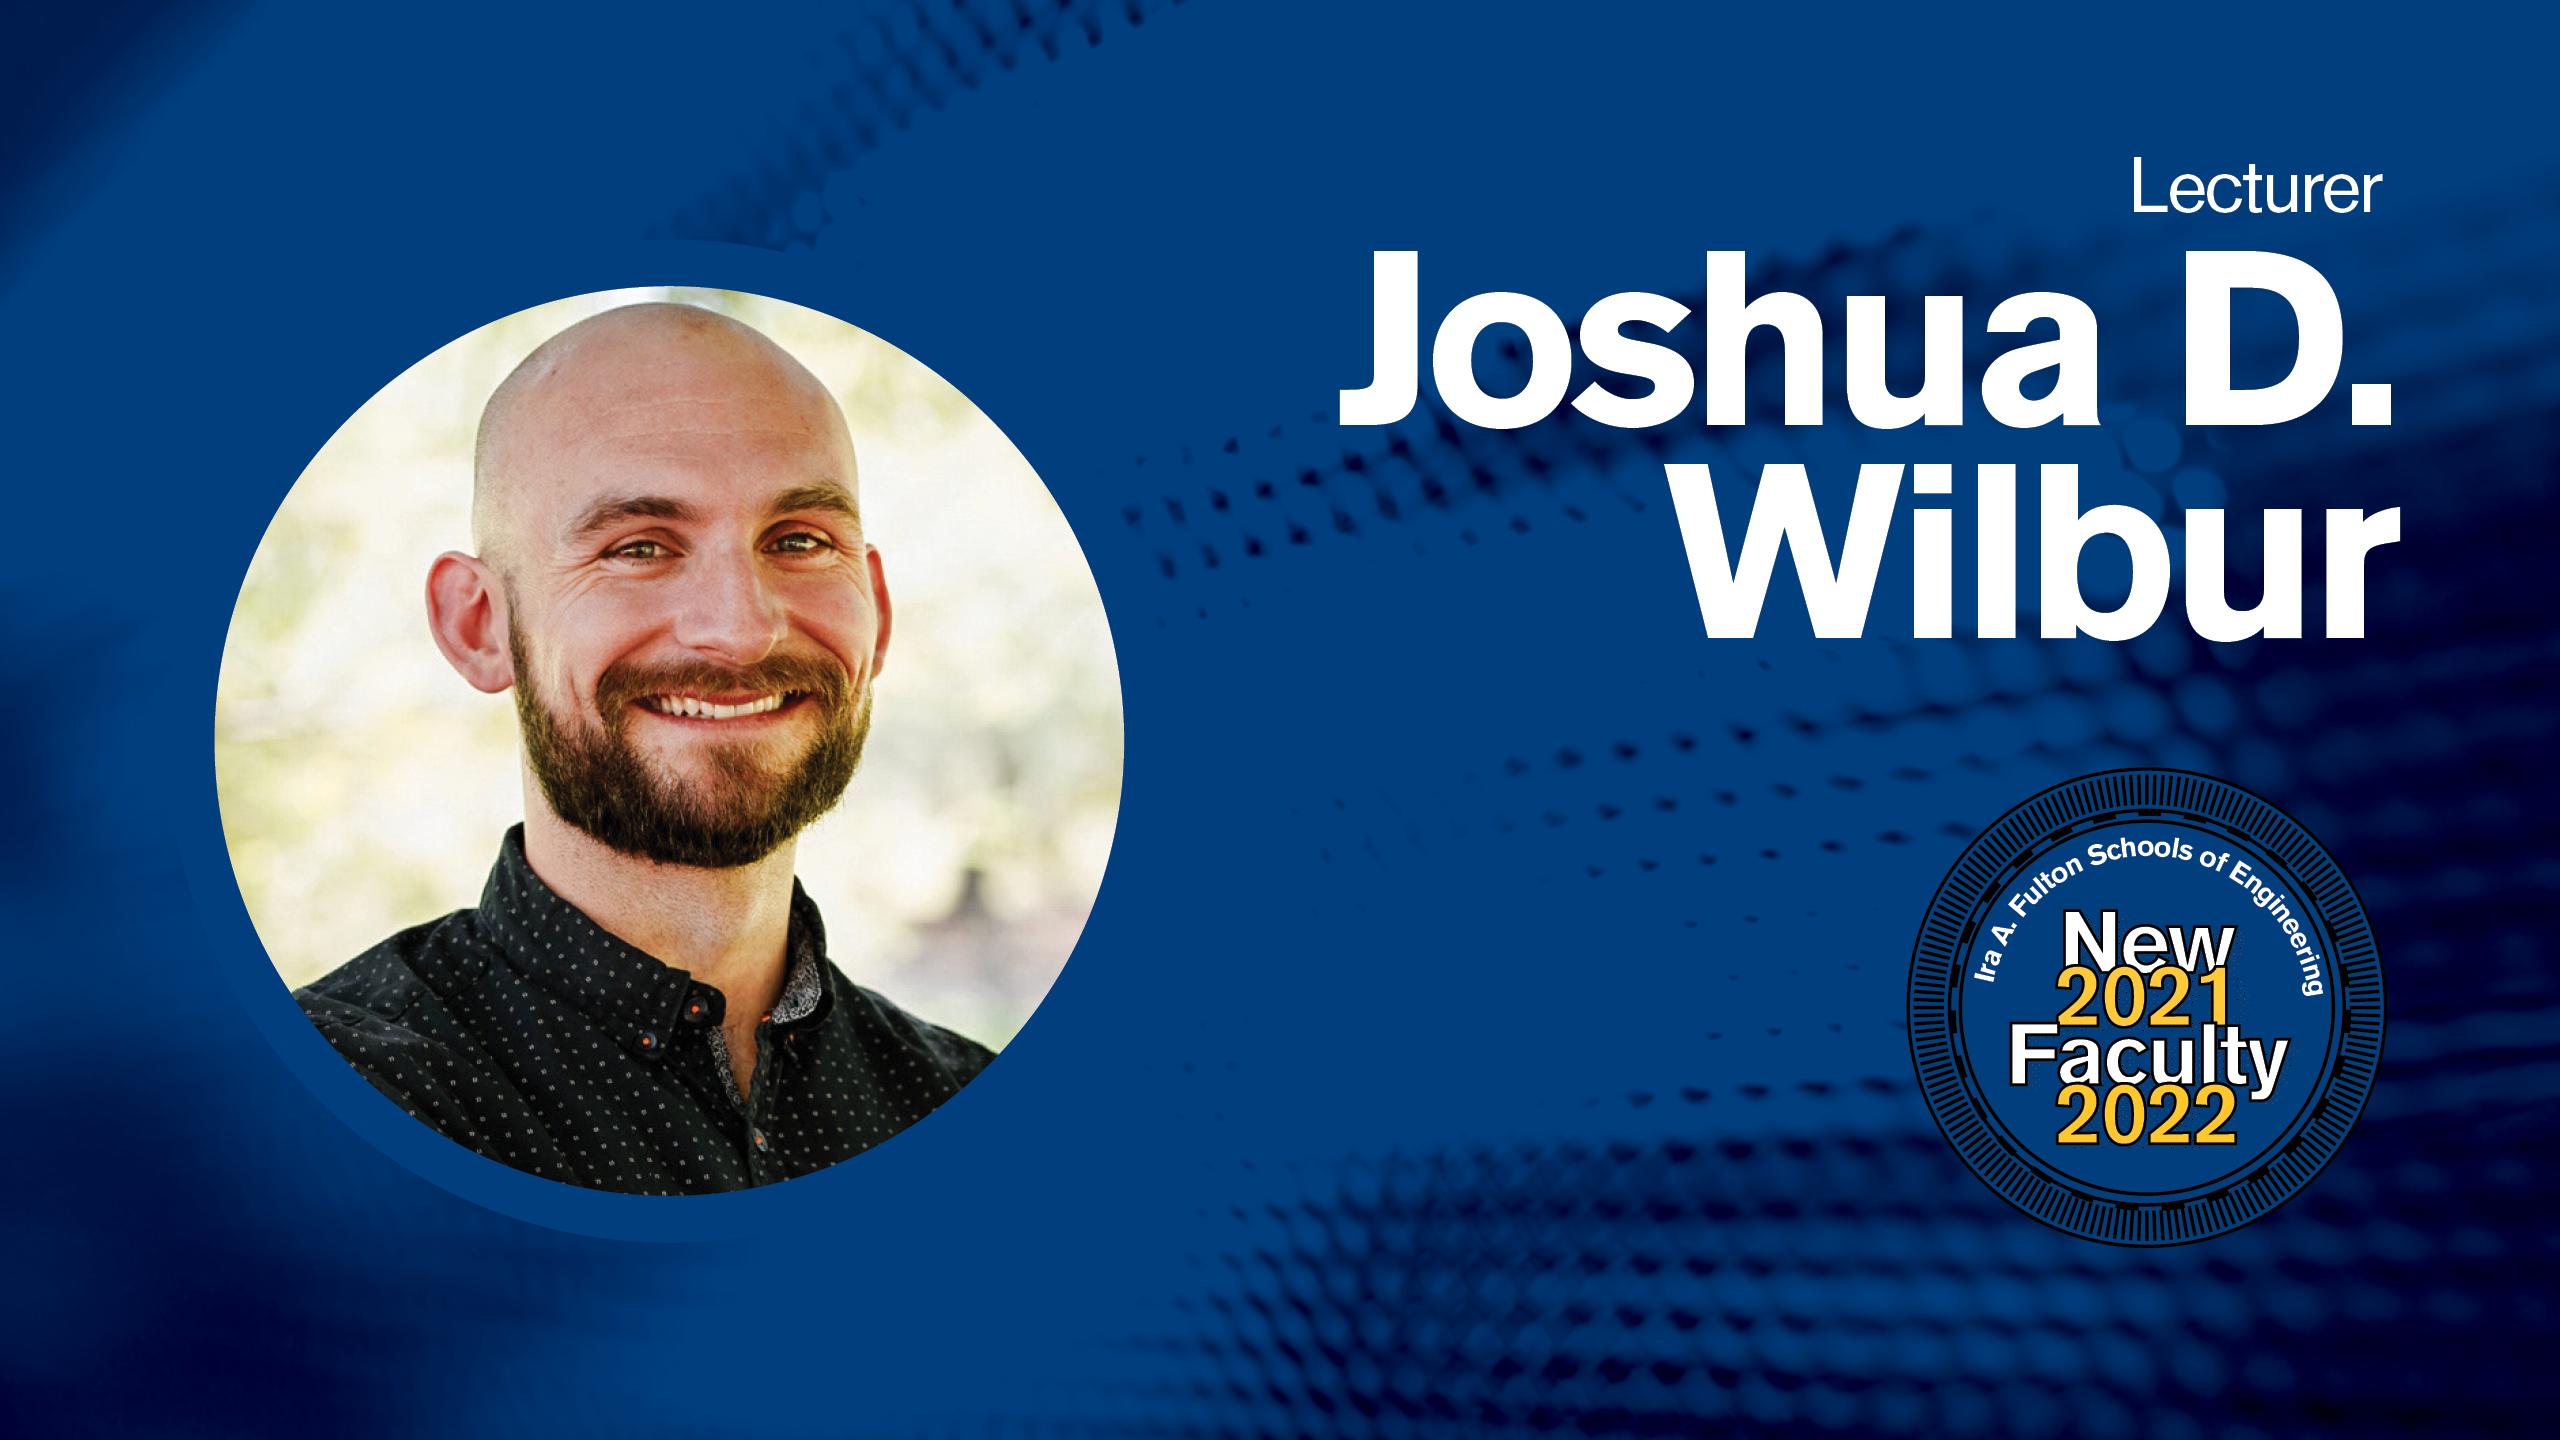 Joshua D. Wilbur